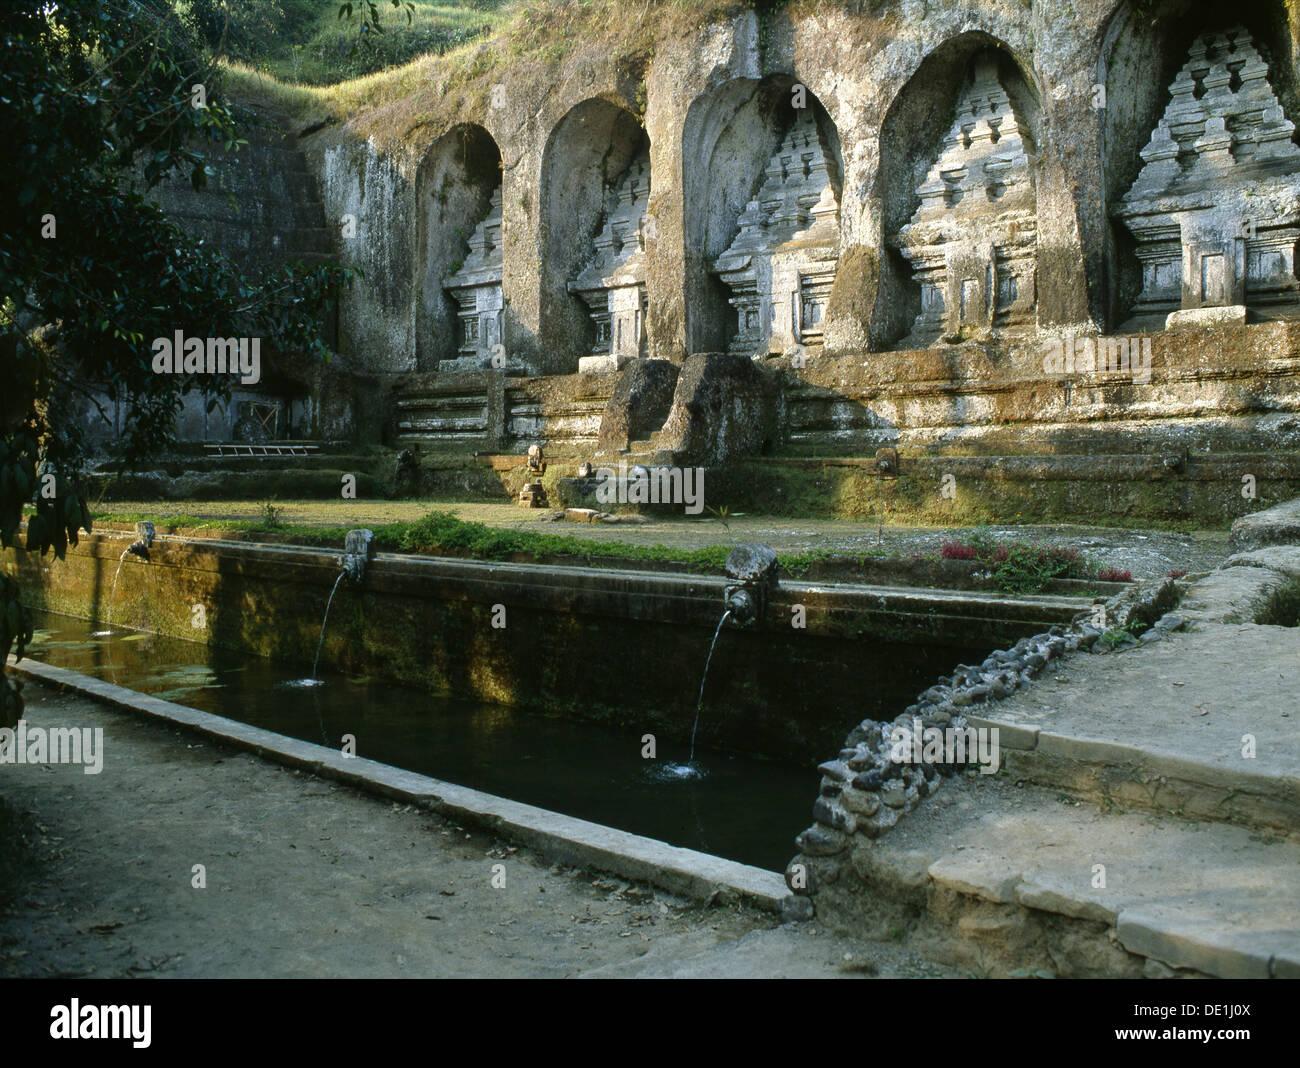 Candi, stone replicas of the cosmic mountain, at Gunung Kawi. - Stock Image